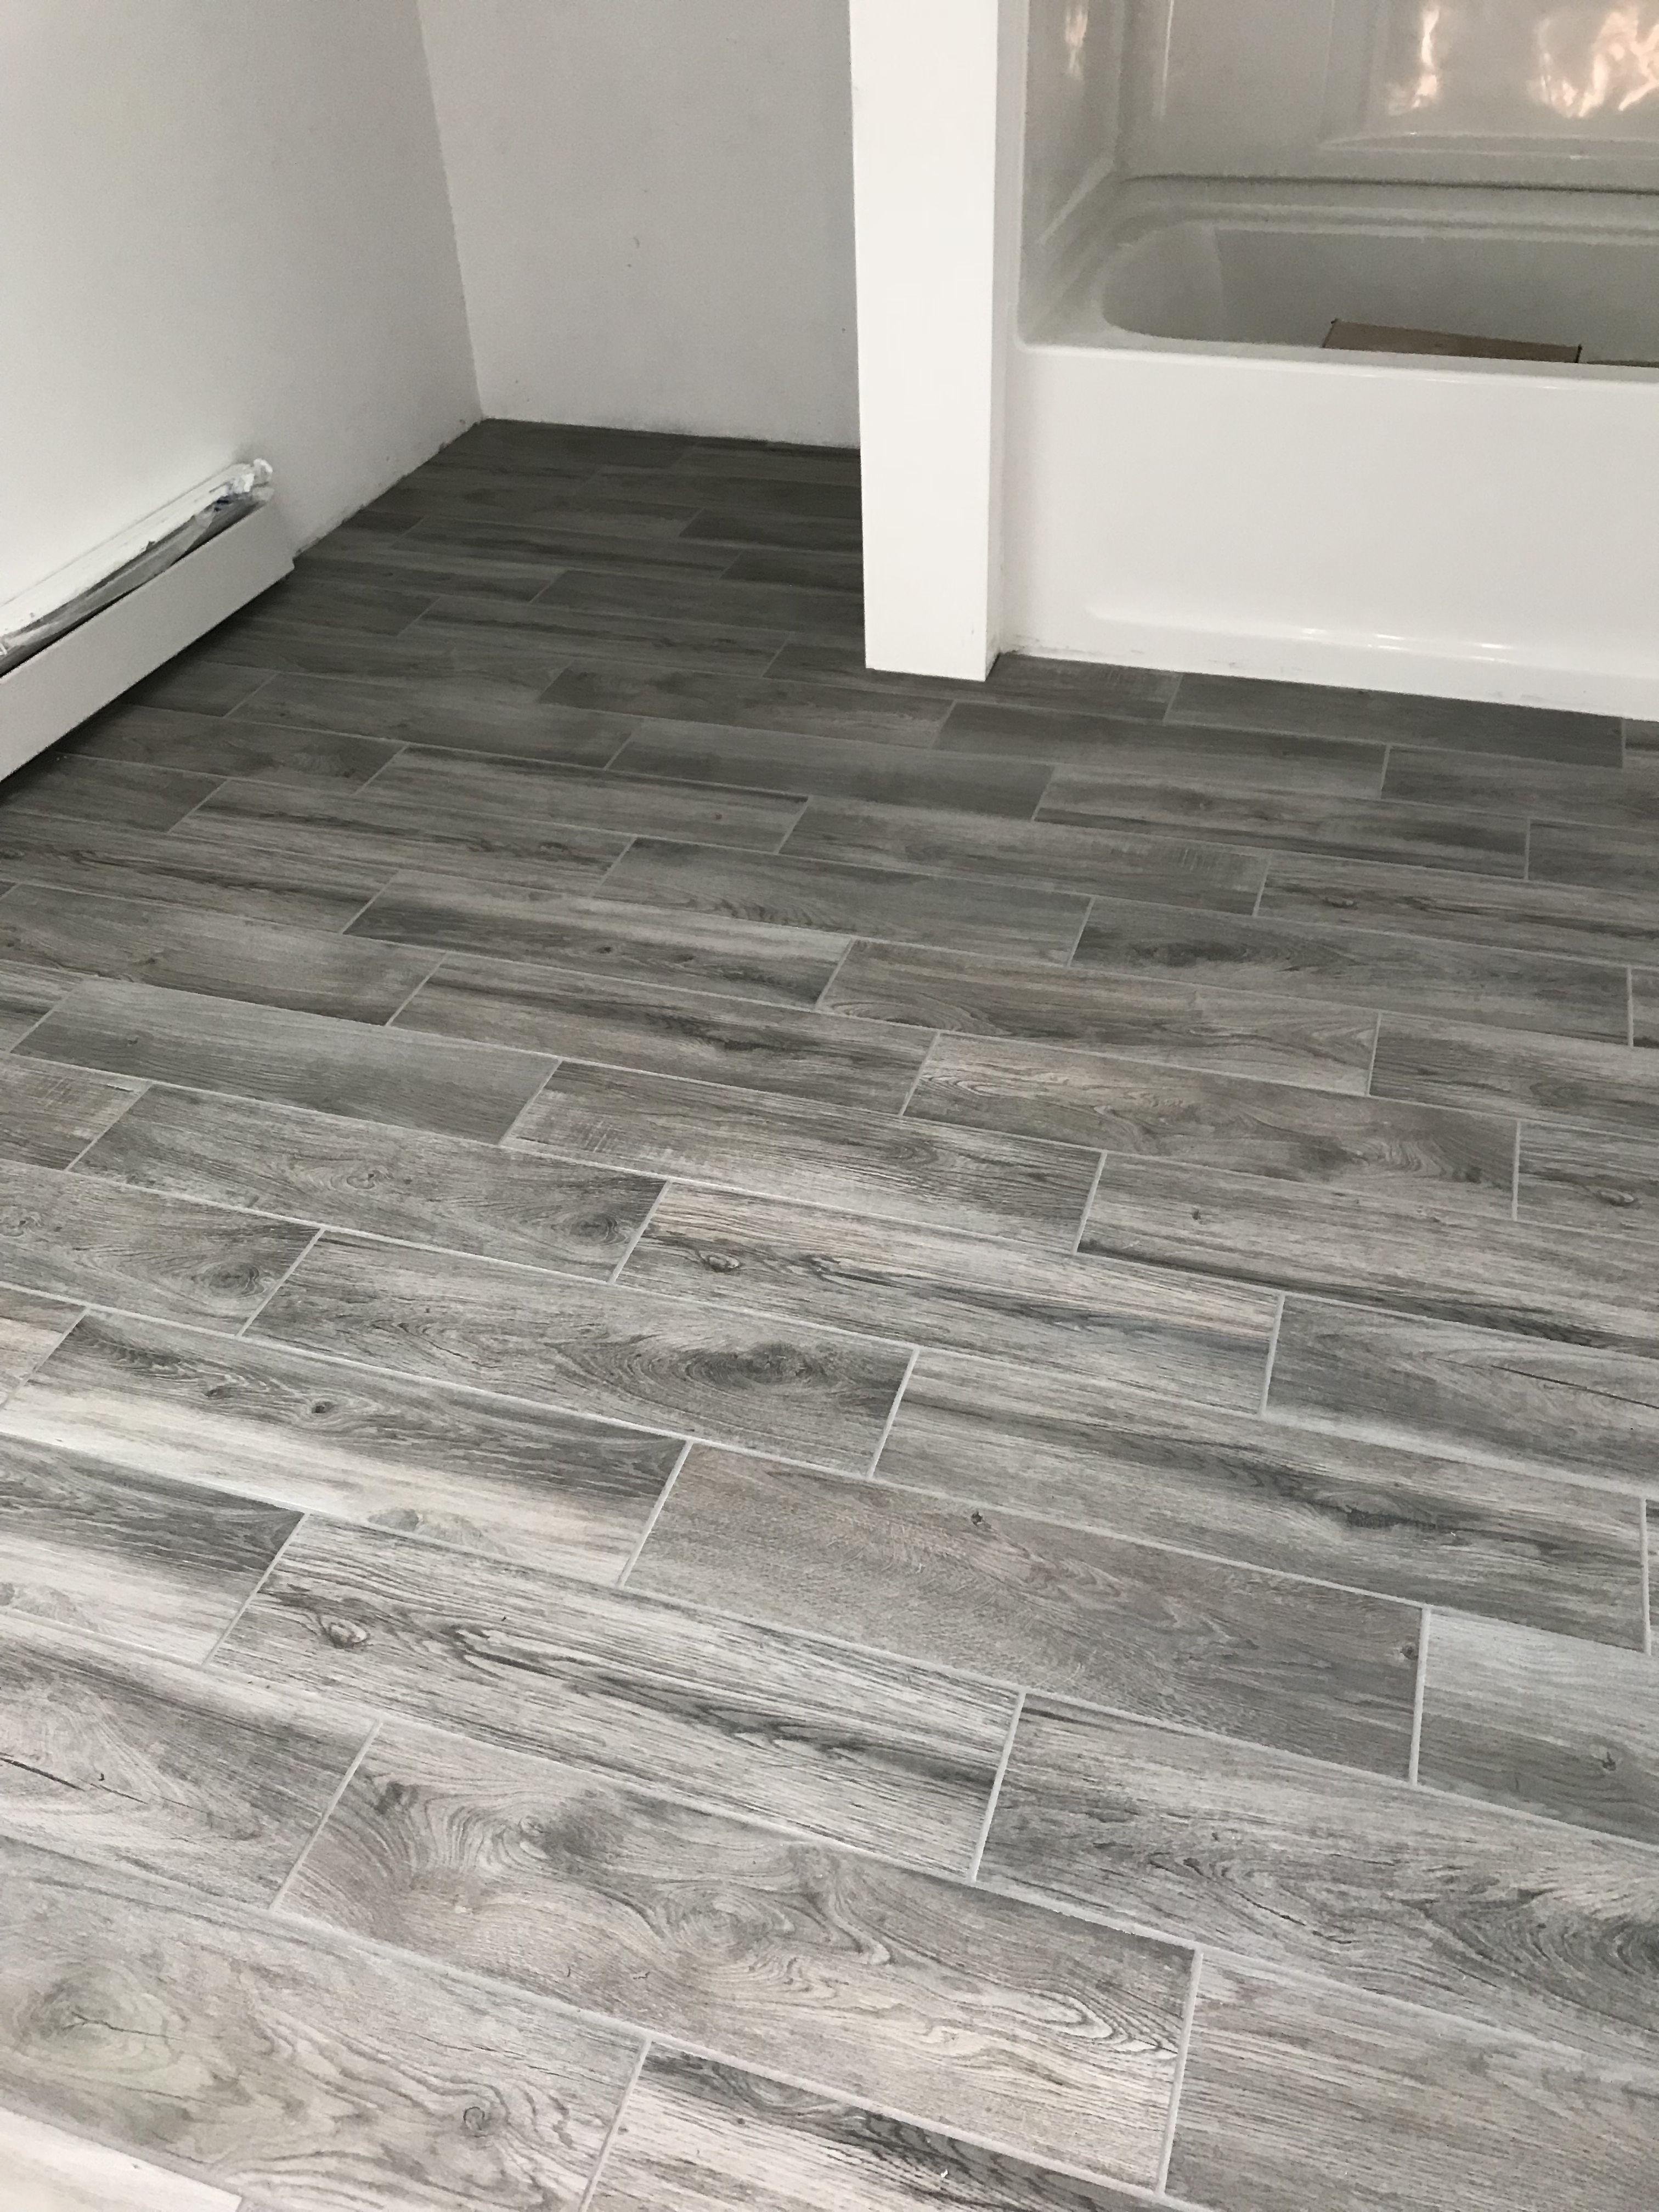 Tile Bathroom Floor Pillowsdecorativeoncouch Wood Look Tile Floor Tile Floor Living Room Ceramic Wood Tile Floor